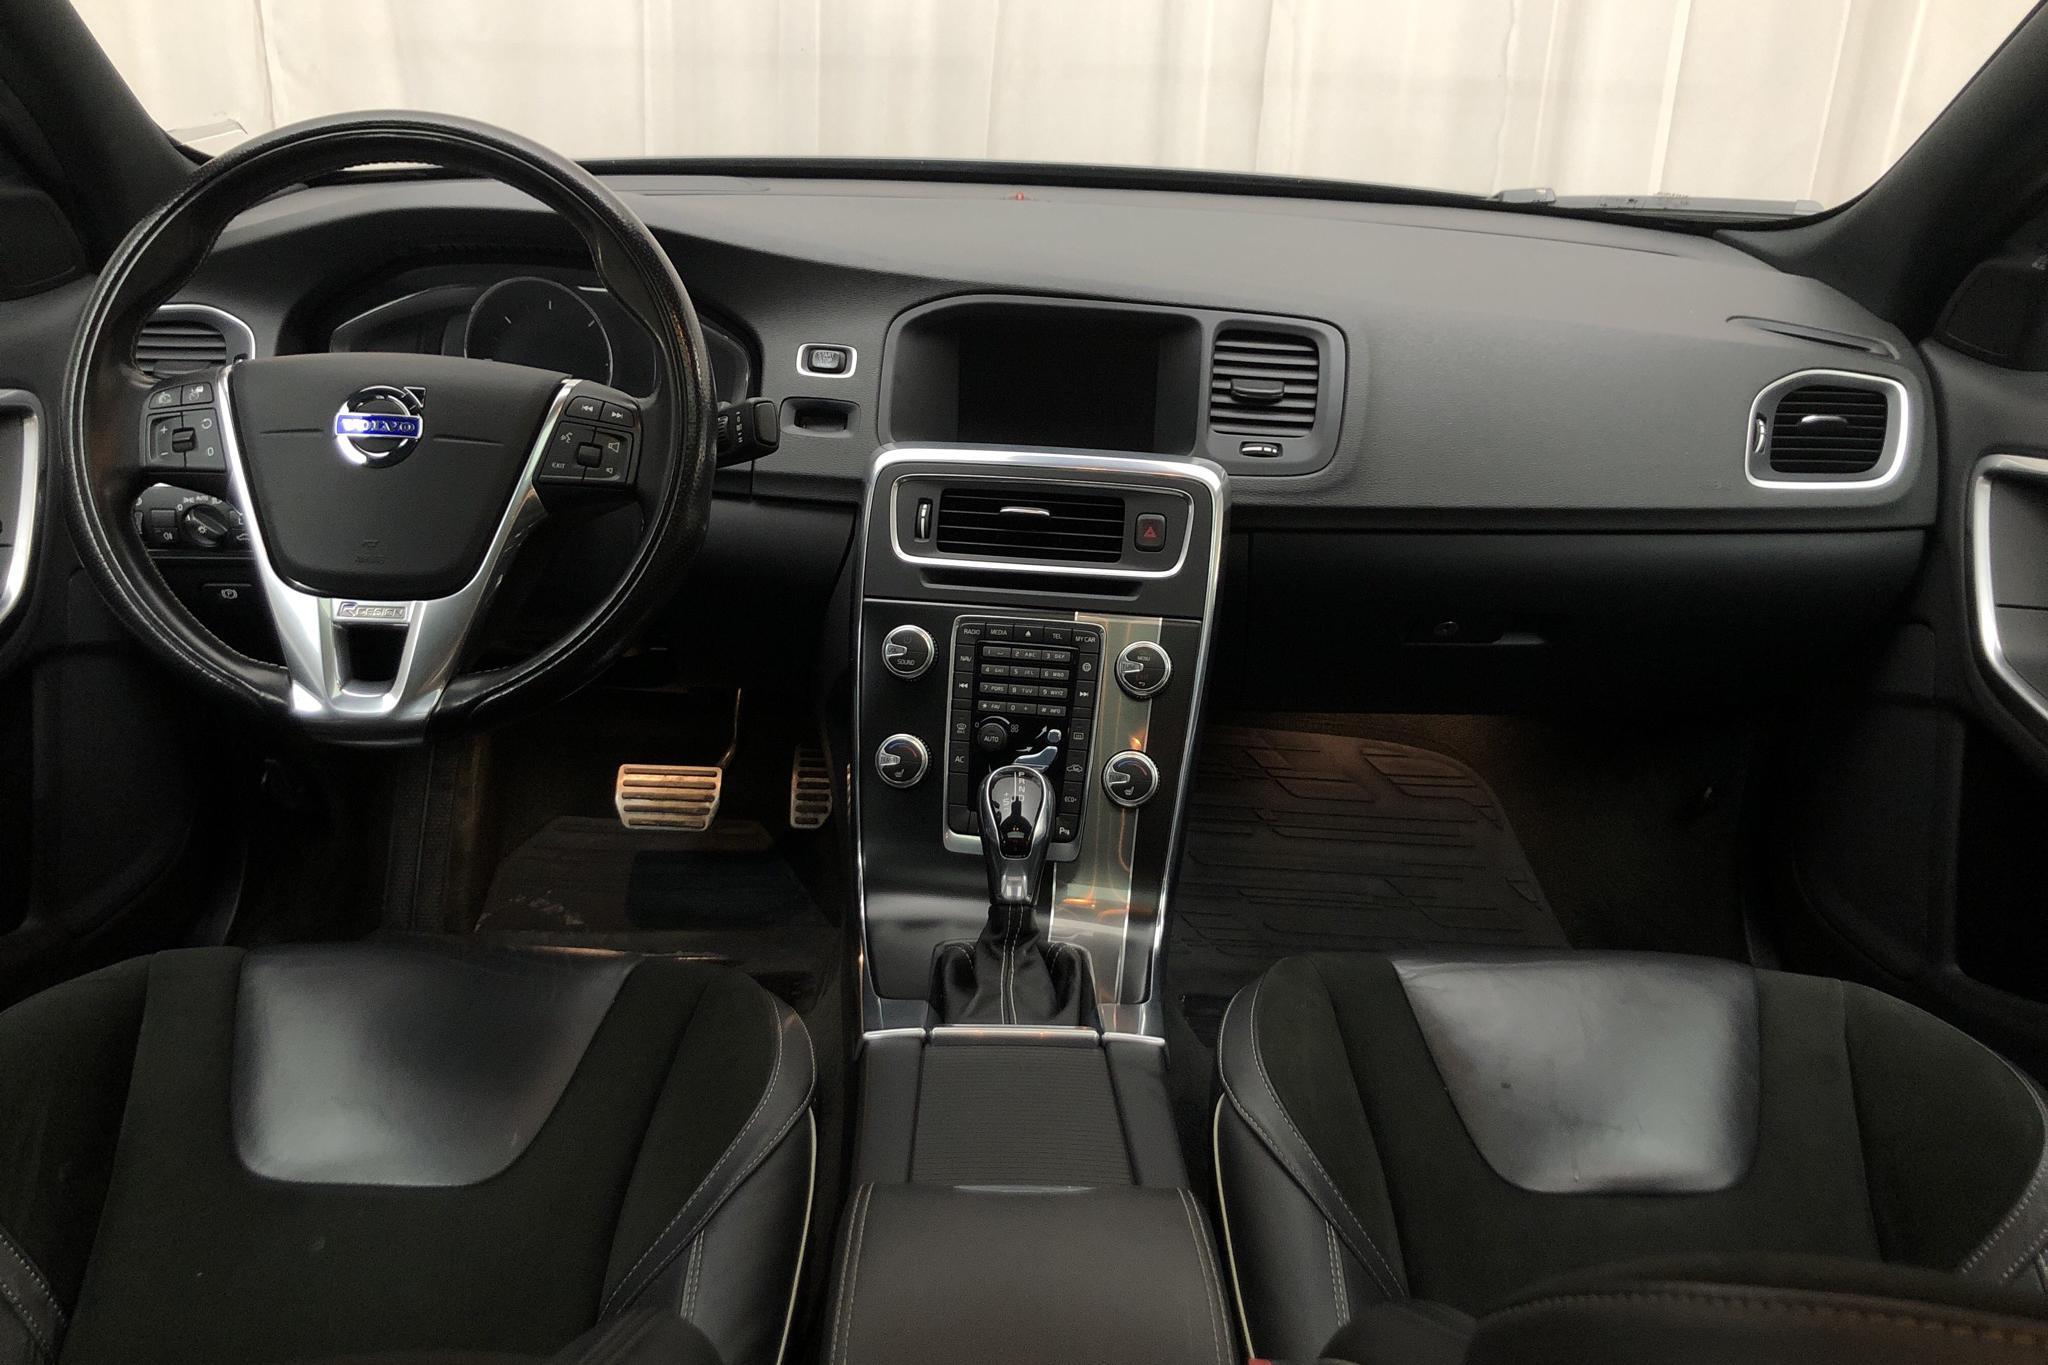 Volvo S60 D4 (190hk) - 9 591 mil - Automat - svart - 2016